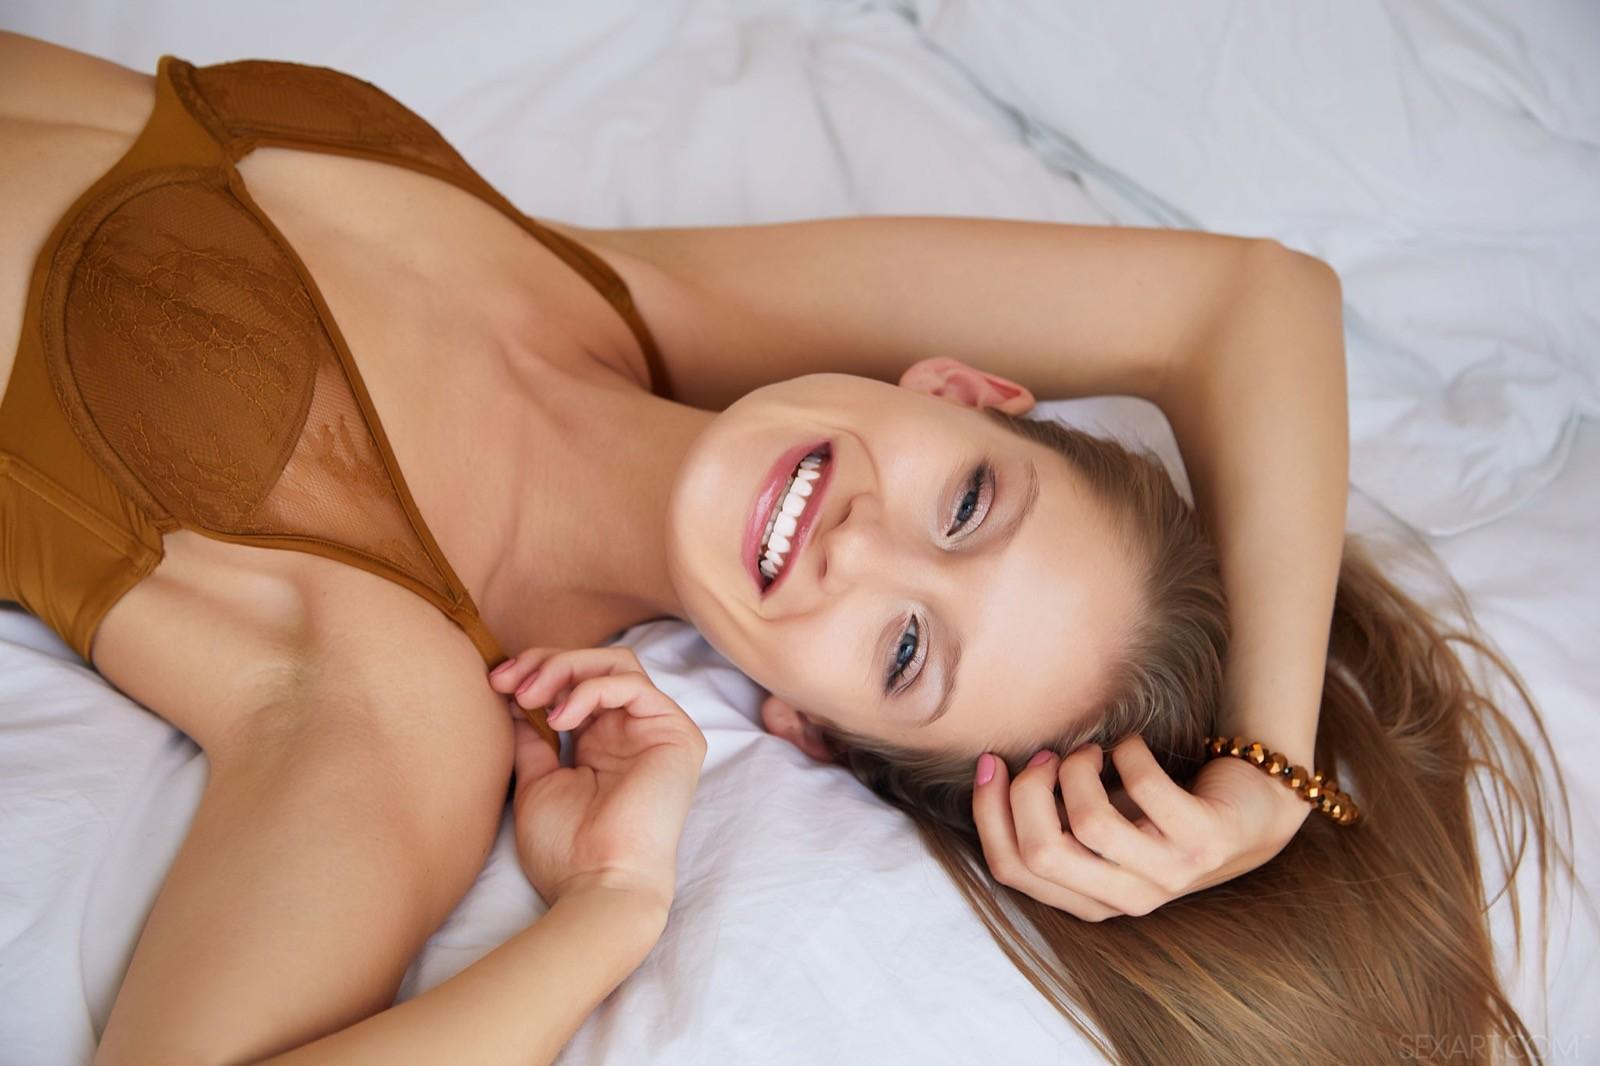 Девушка с красивыми ногами на кровати - фото